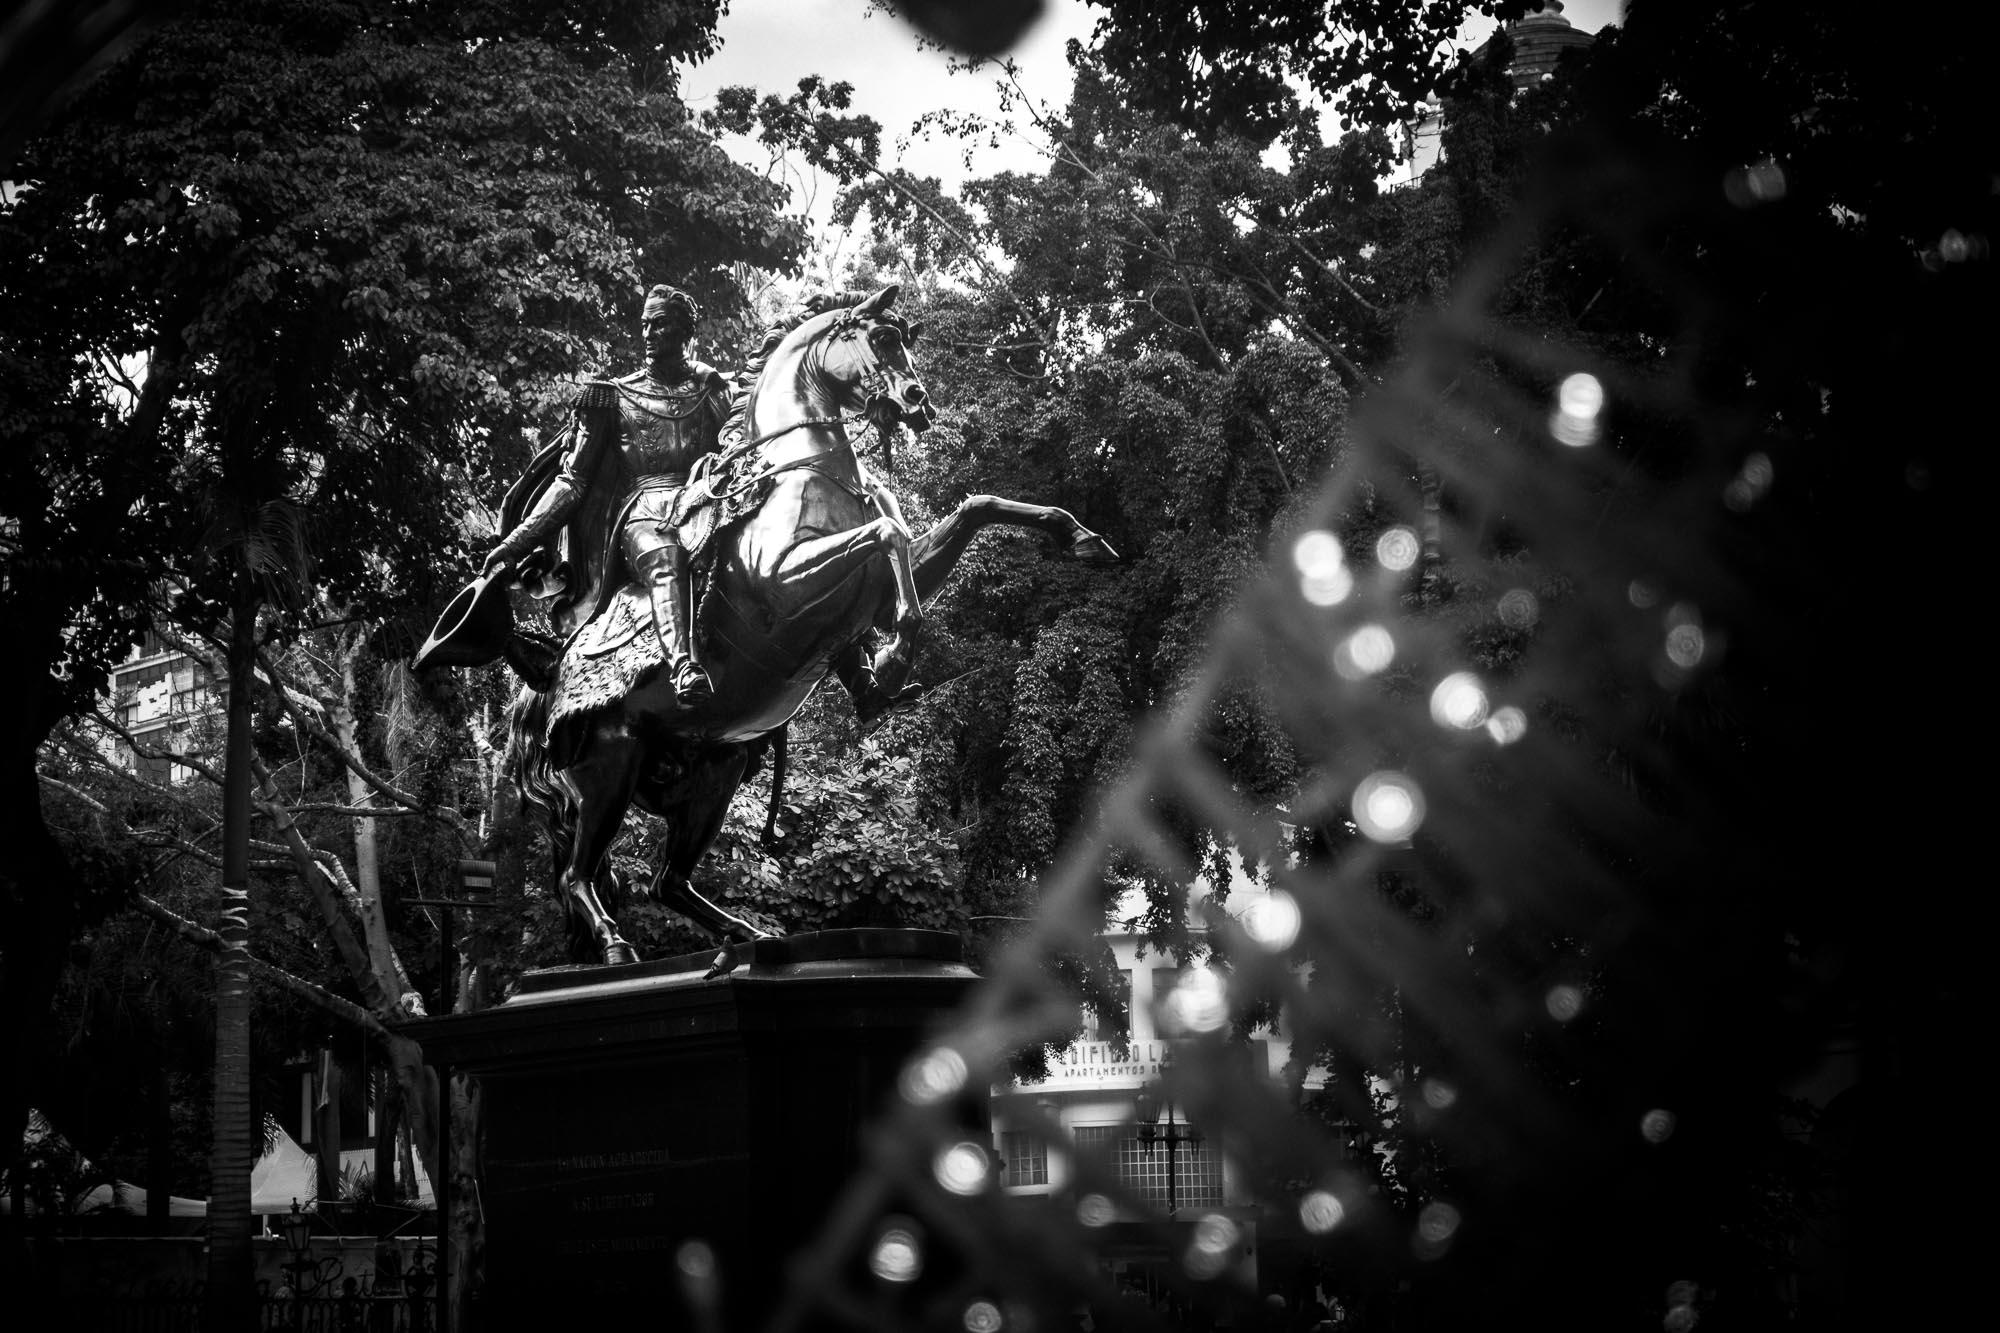 Bolivar-Riding.jpg